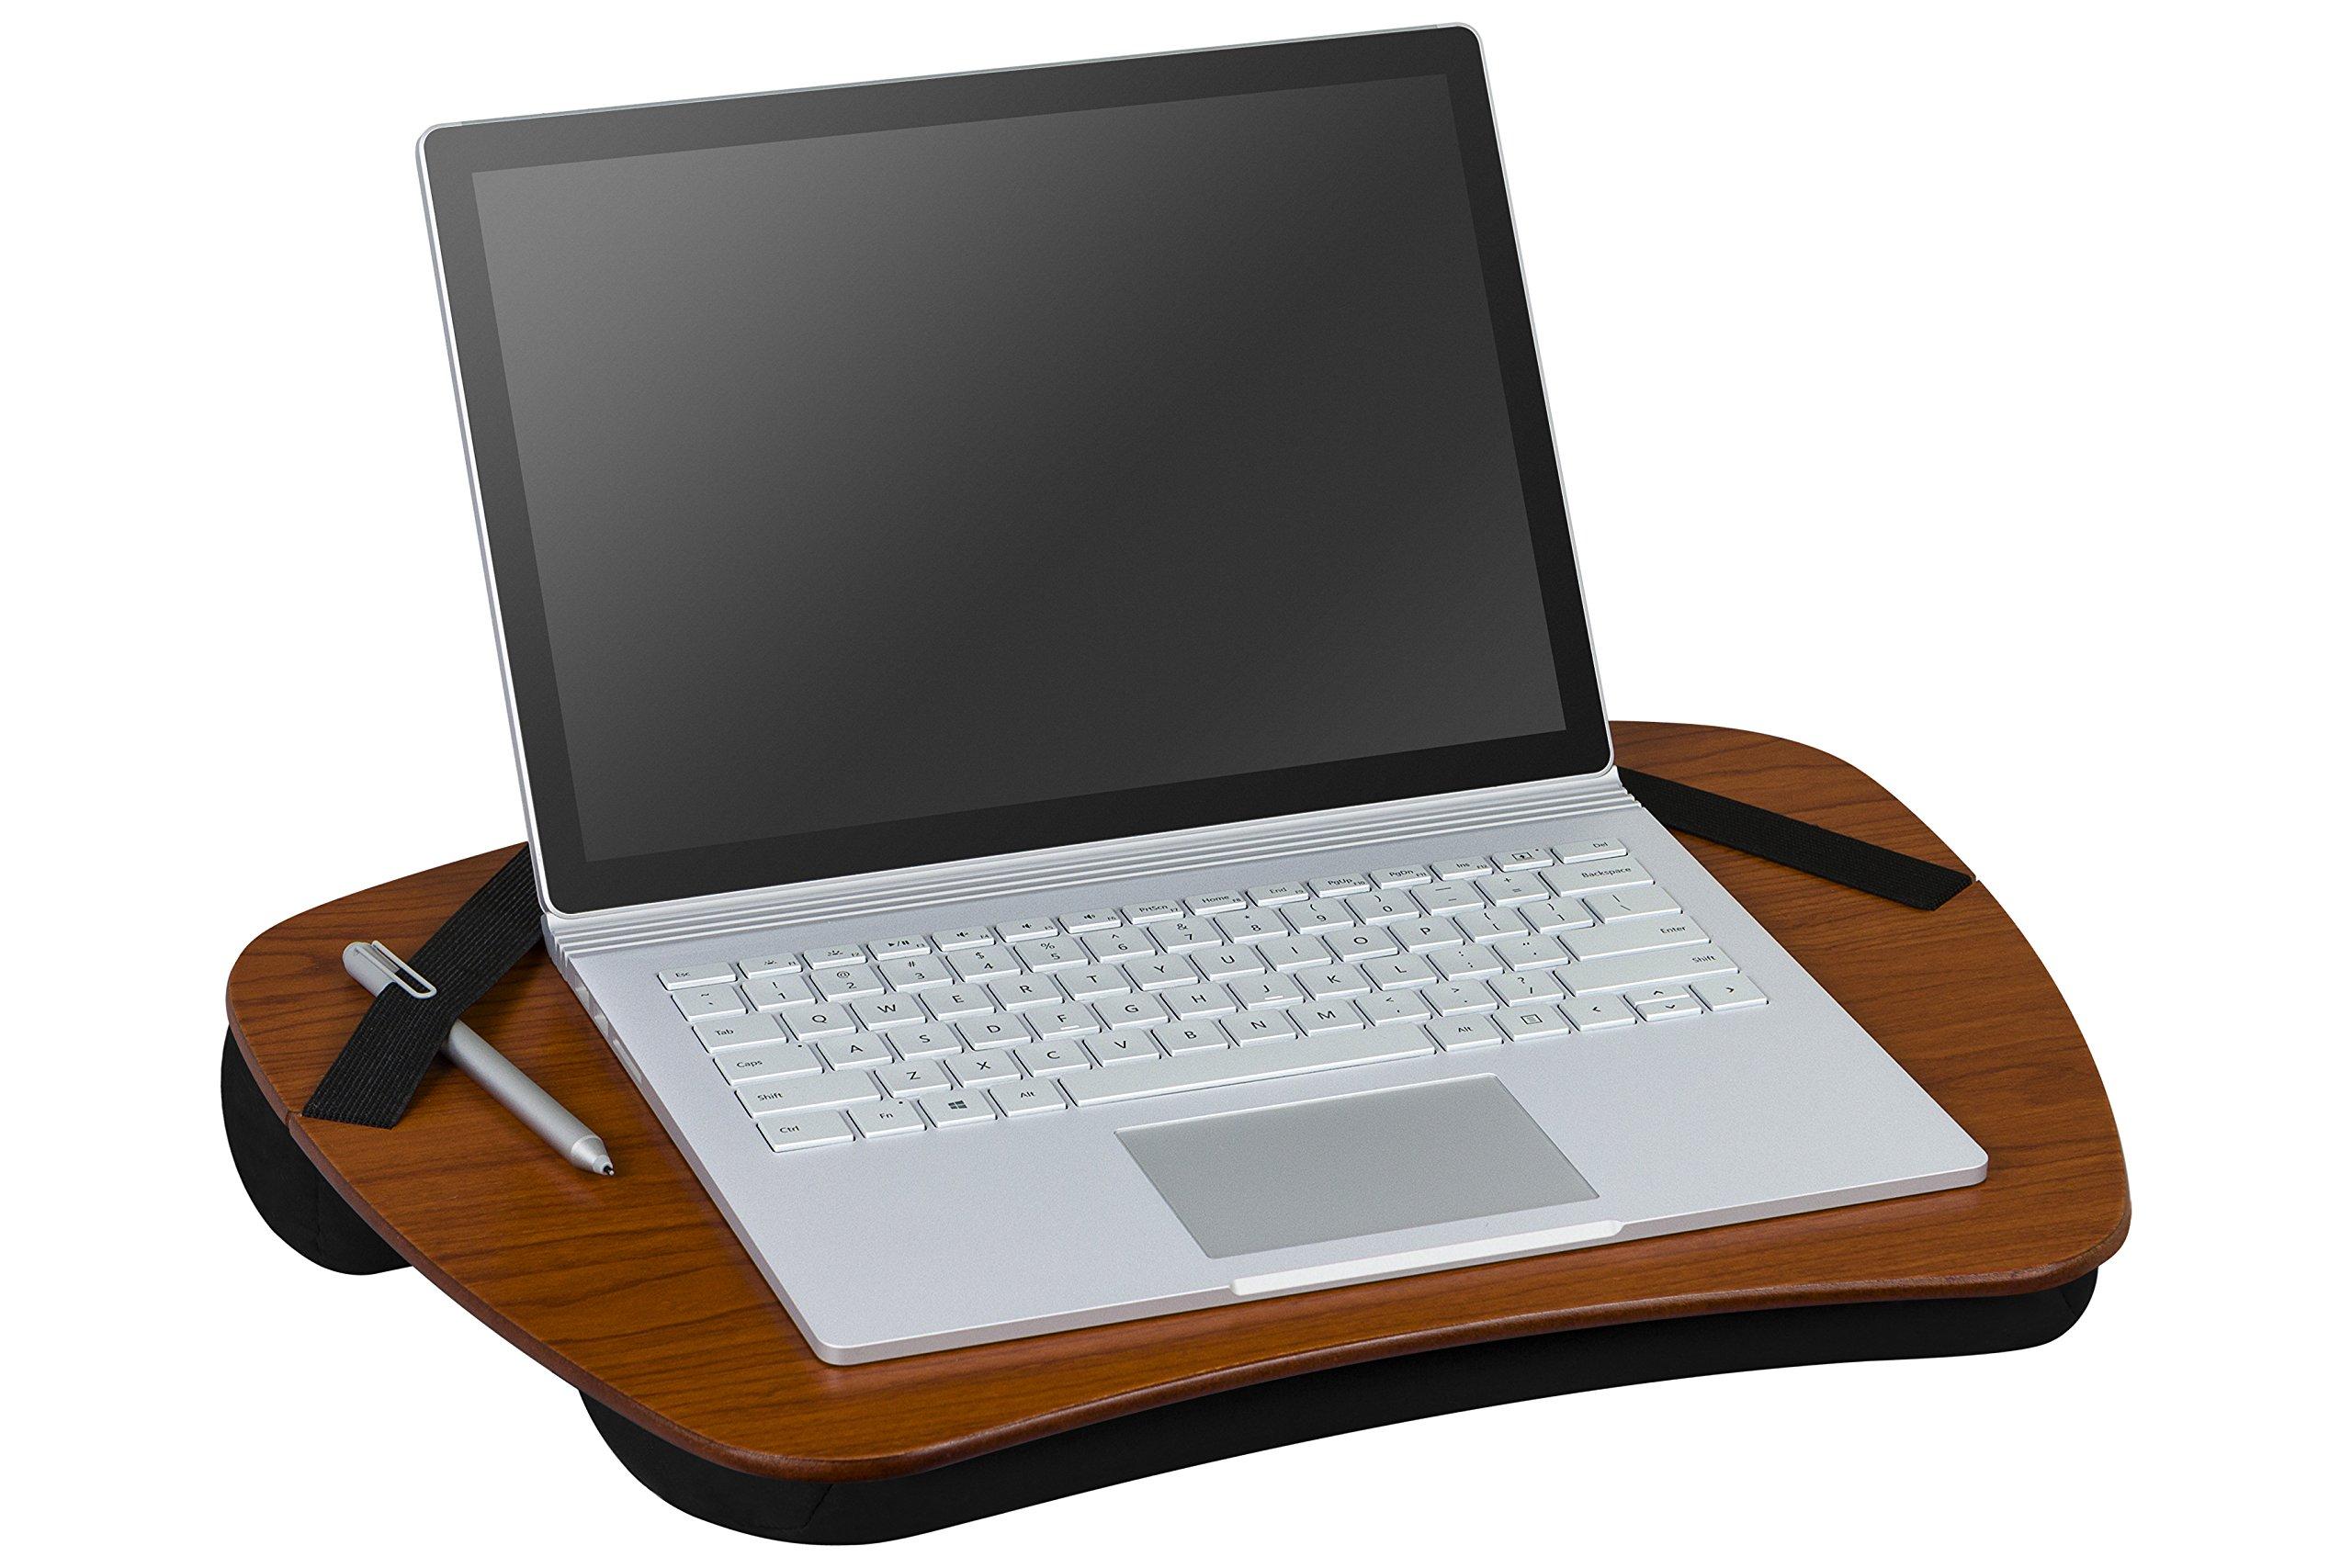 LapGear Executive - Cherry Woodgrain (Fits up to 15.6'' Laptop)